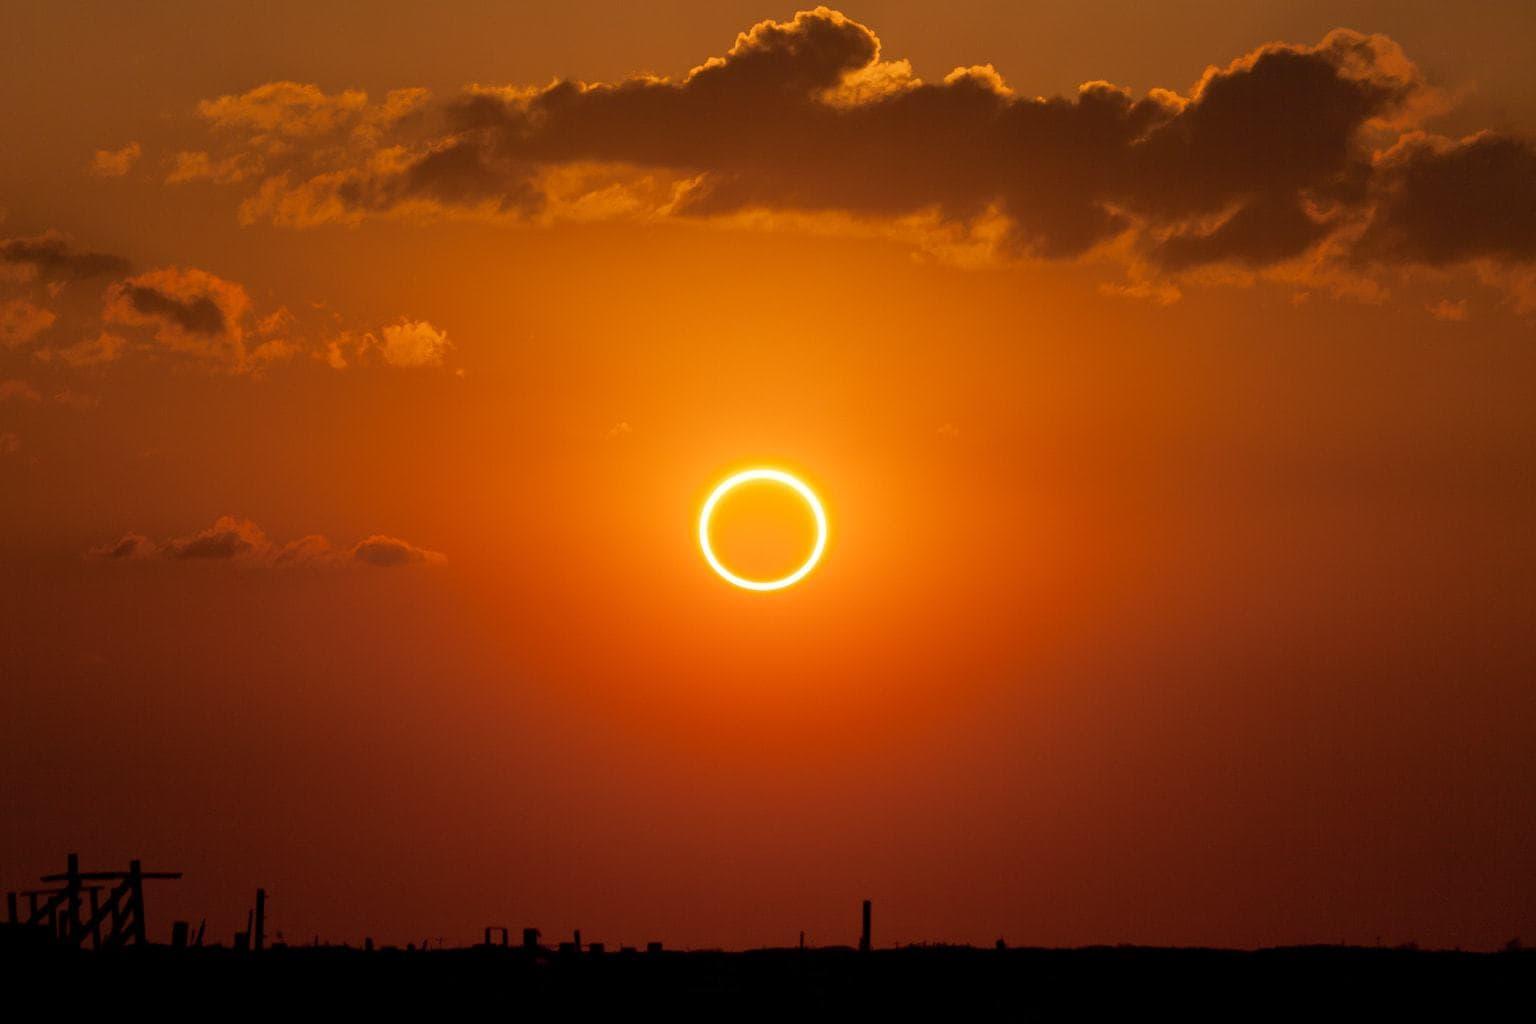 fotografía paisaje de un eclipse solar